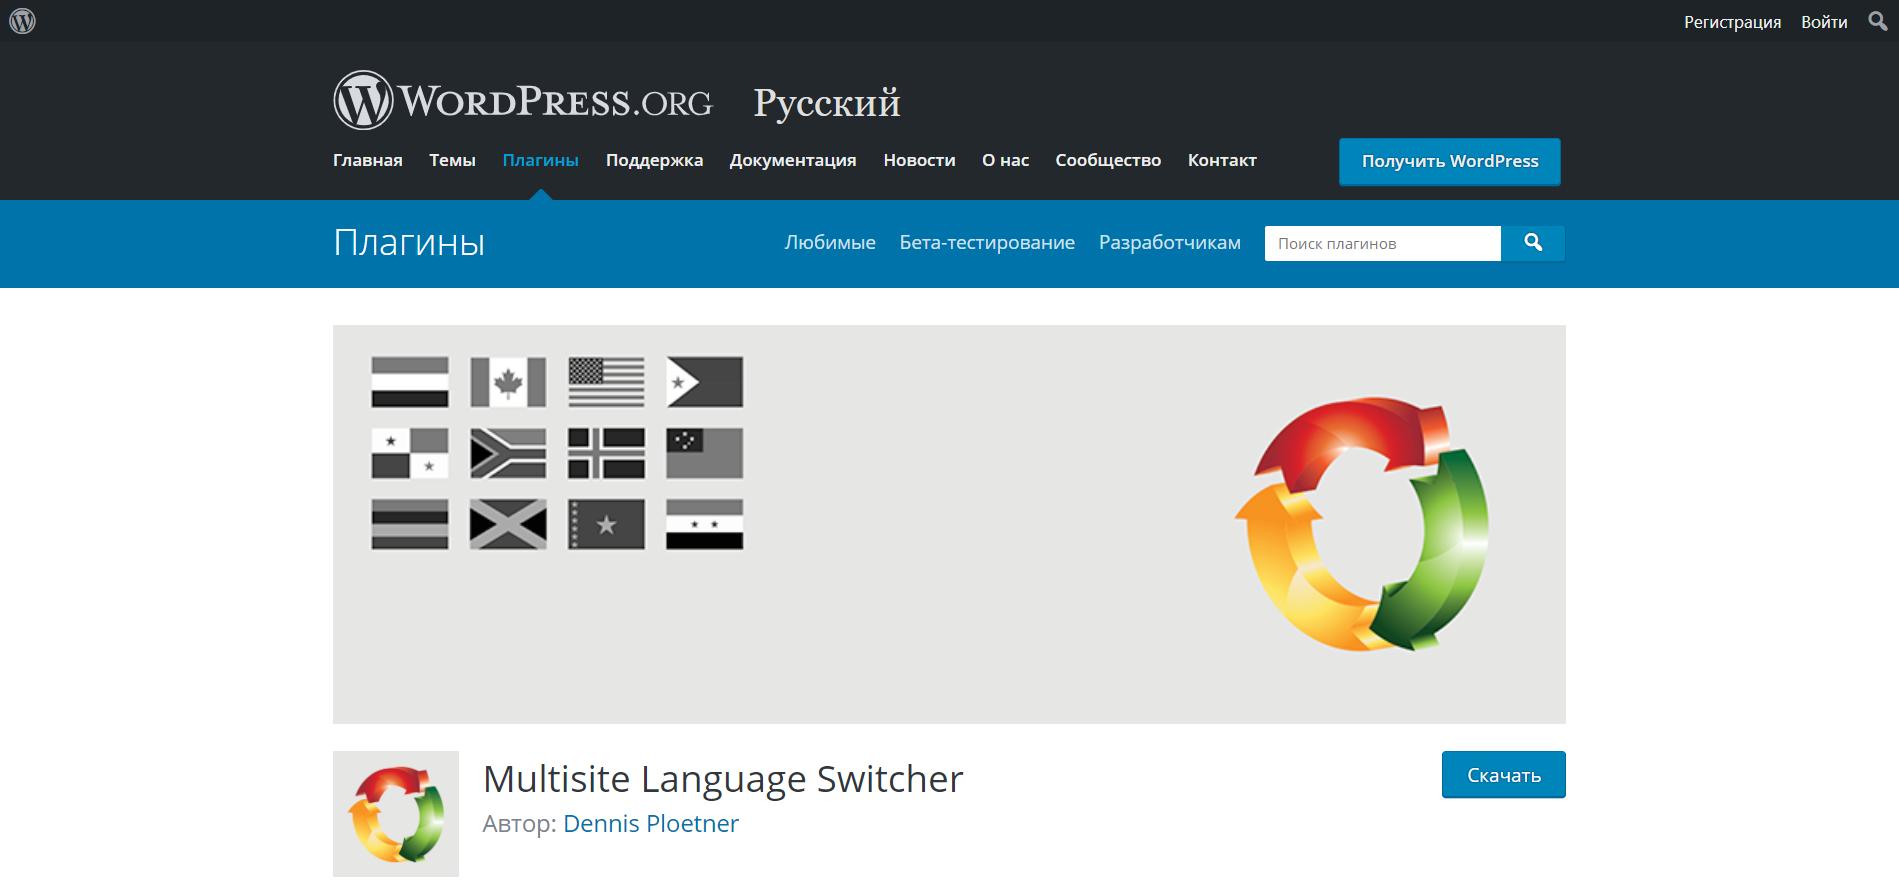 Multisite Language Switcher плагин для перевода сайта на WordPress